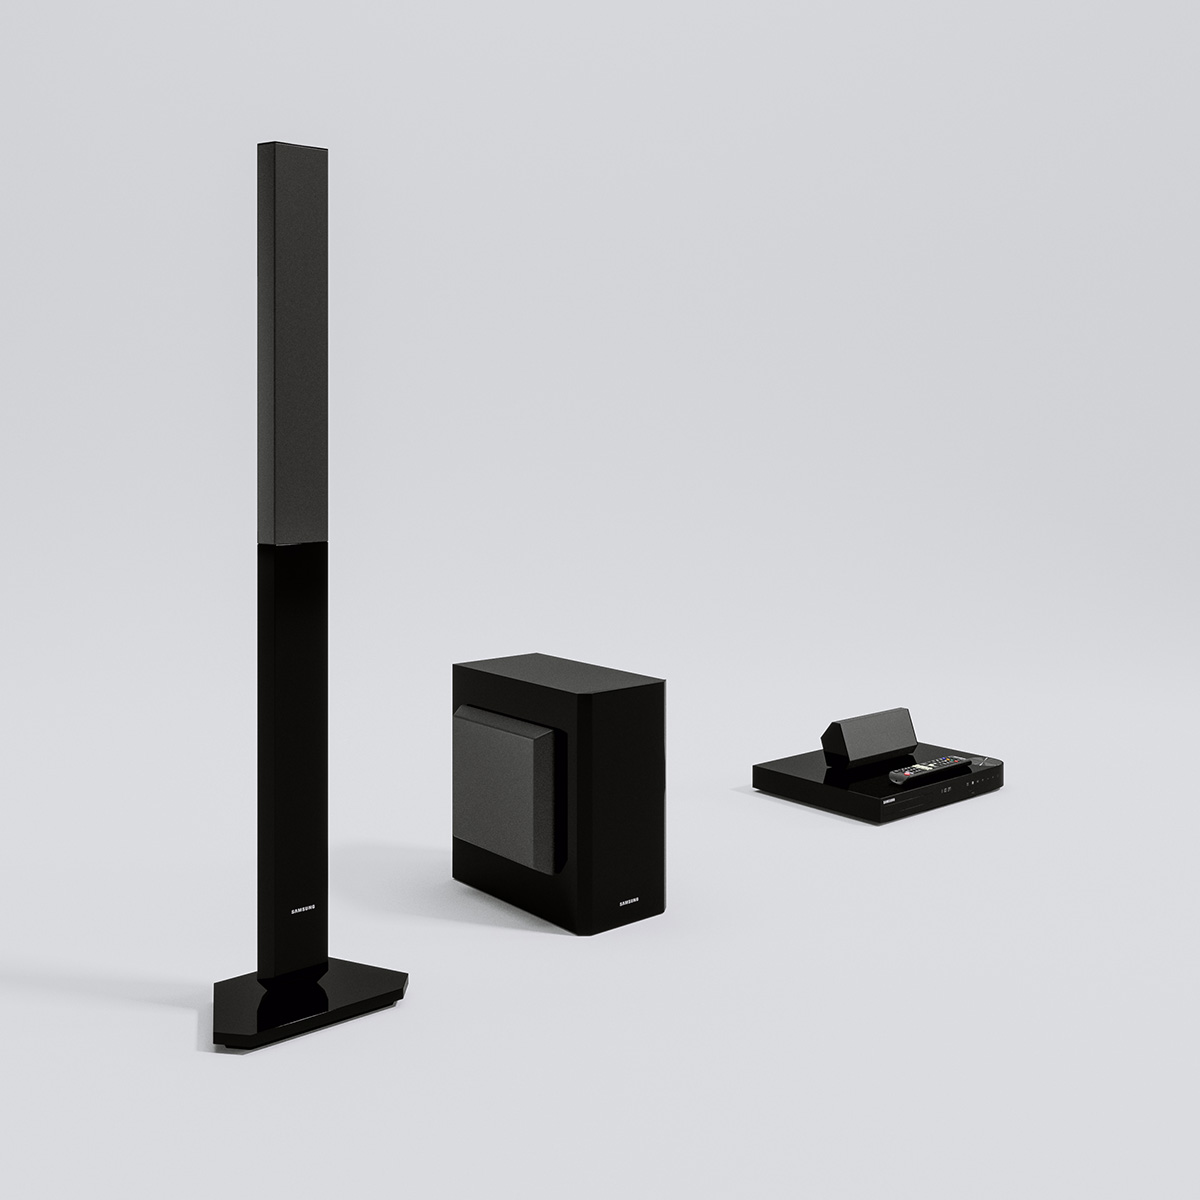 4D Max Cinema home cinema samsung – triangle form – 3d models | scenes